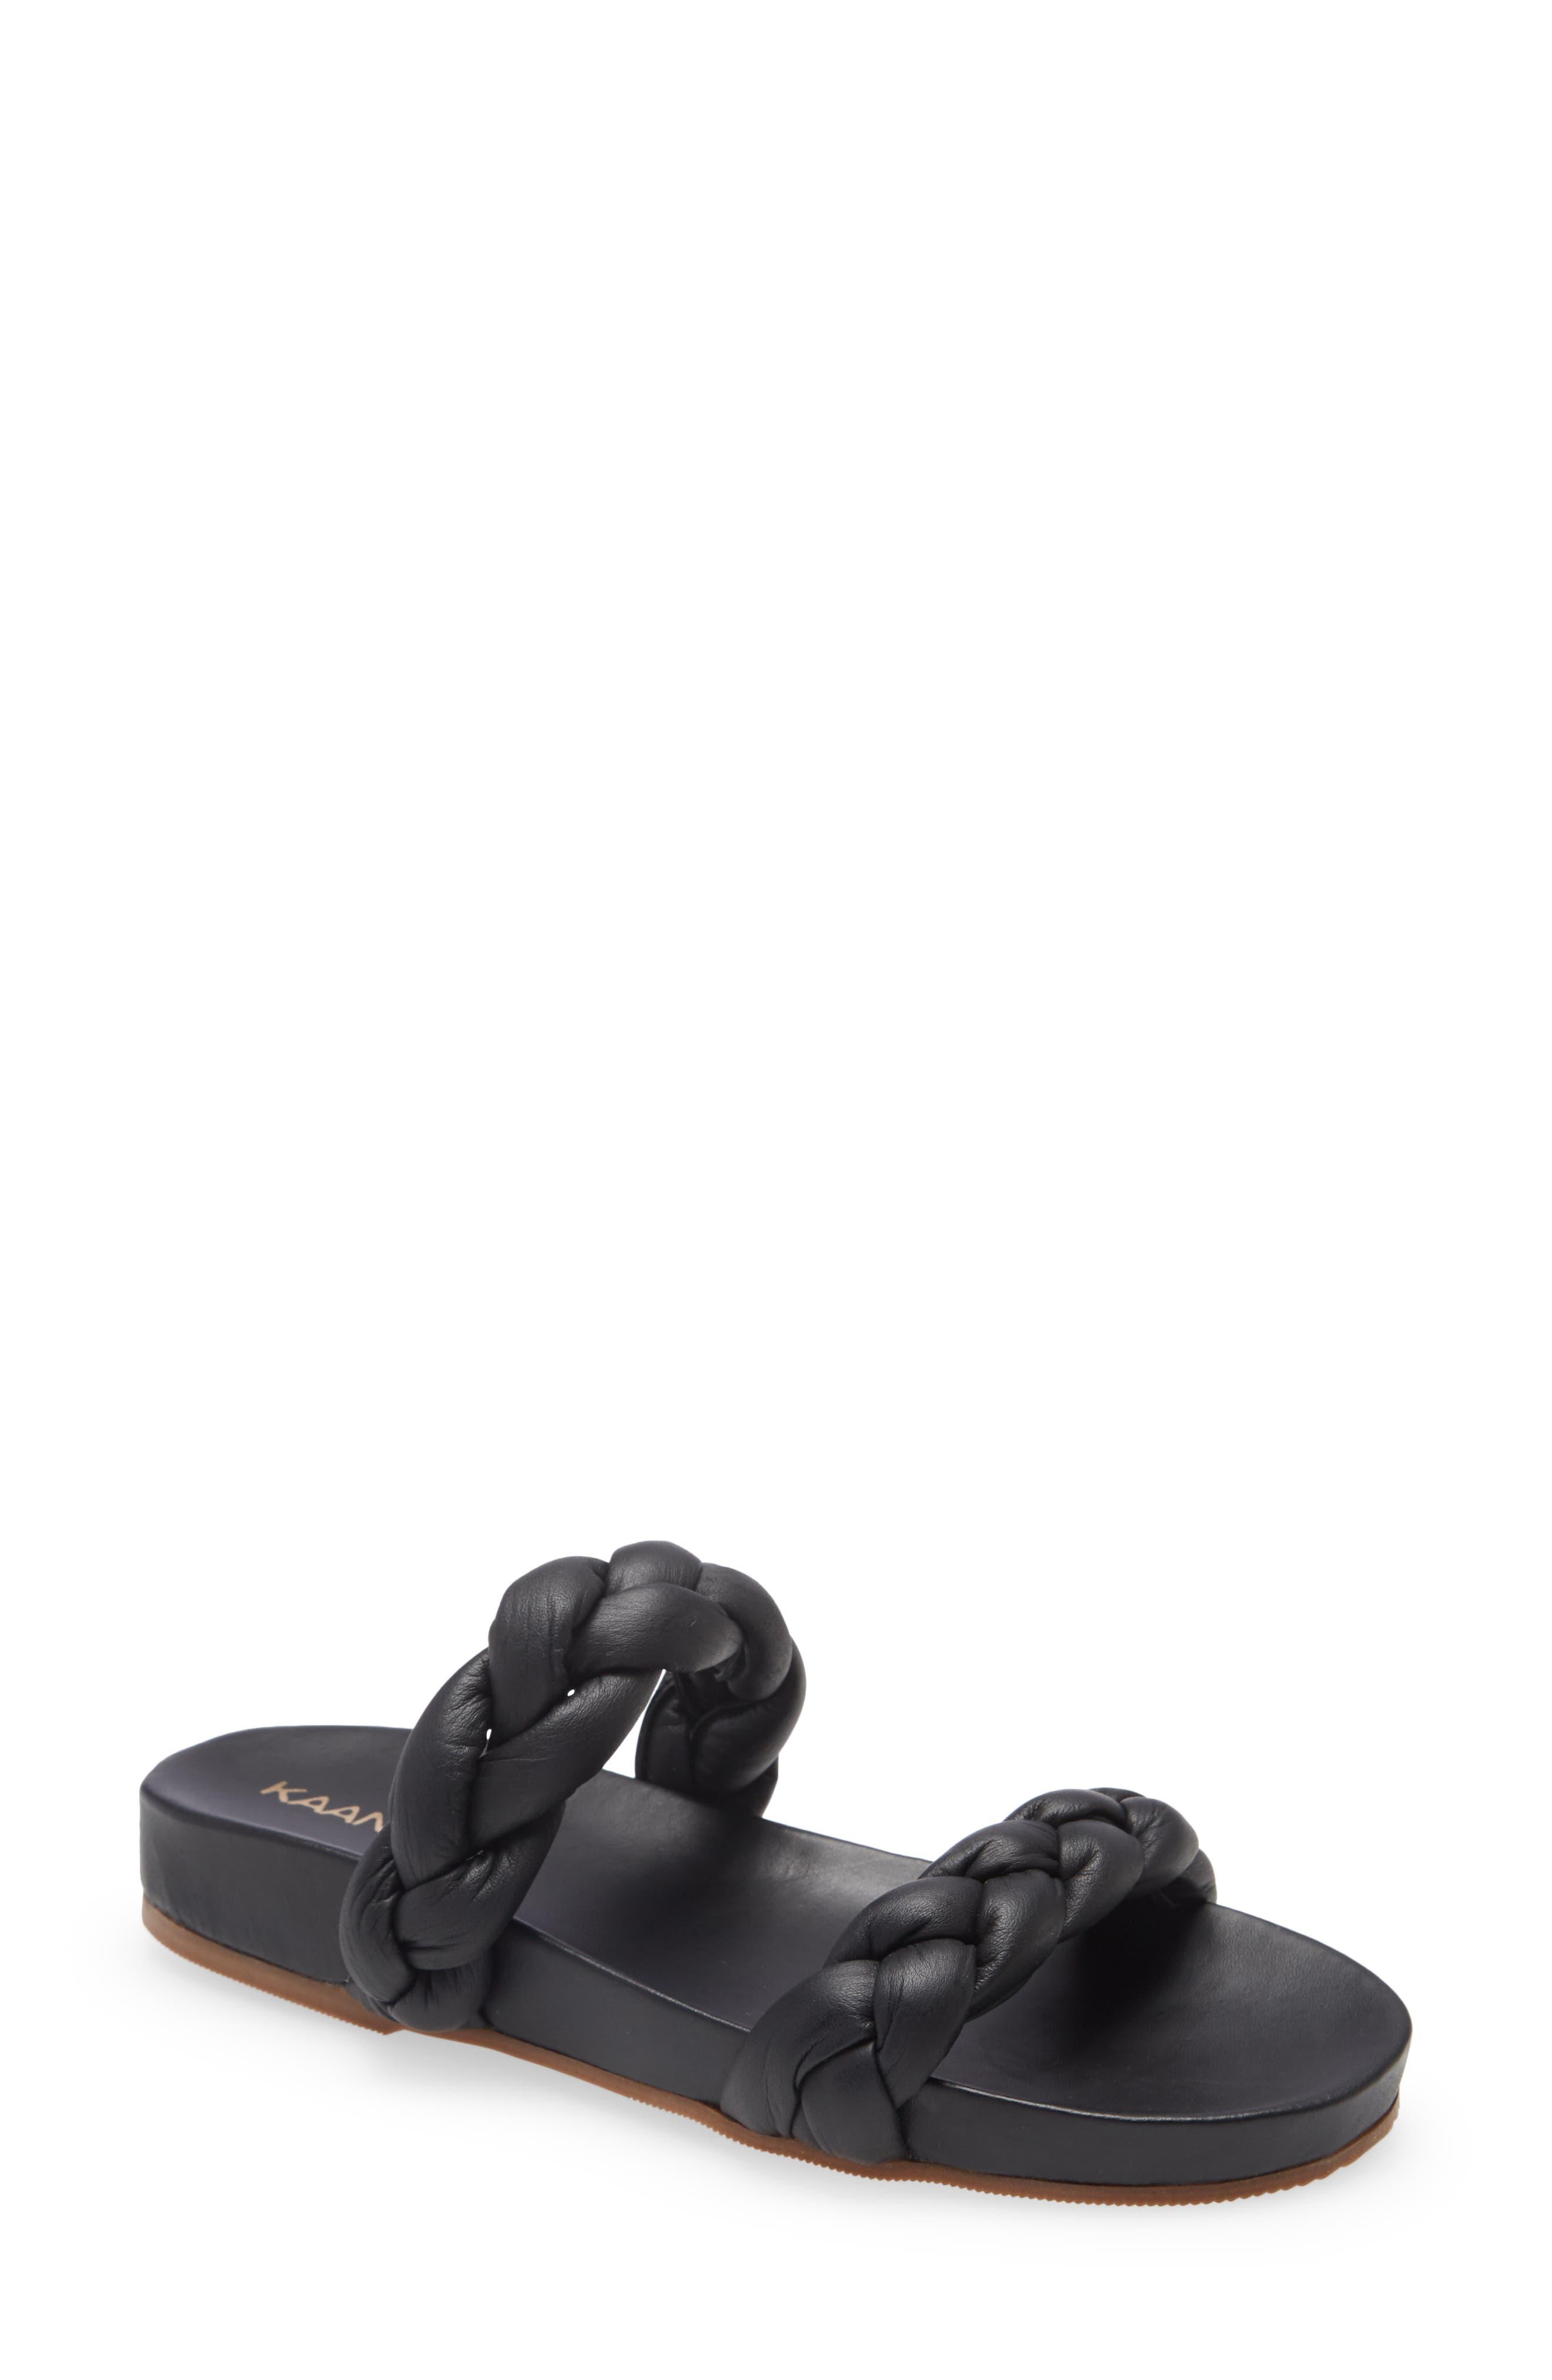 Coco Braided Slide Sandal